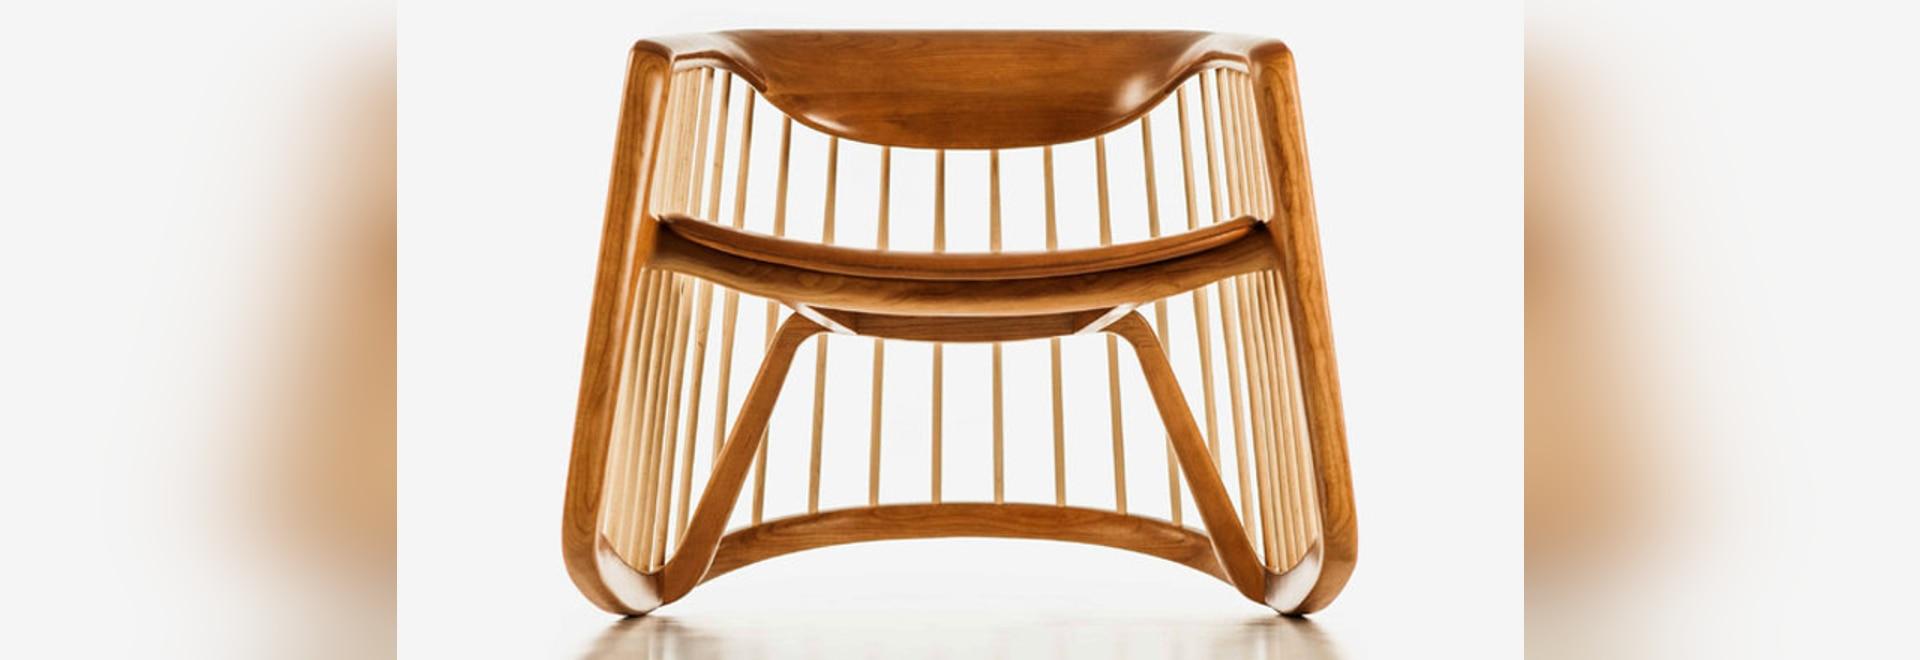 Harper Rocking Chair by Noé Duchaufour Lawrance for Bernhardt Design